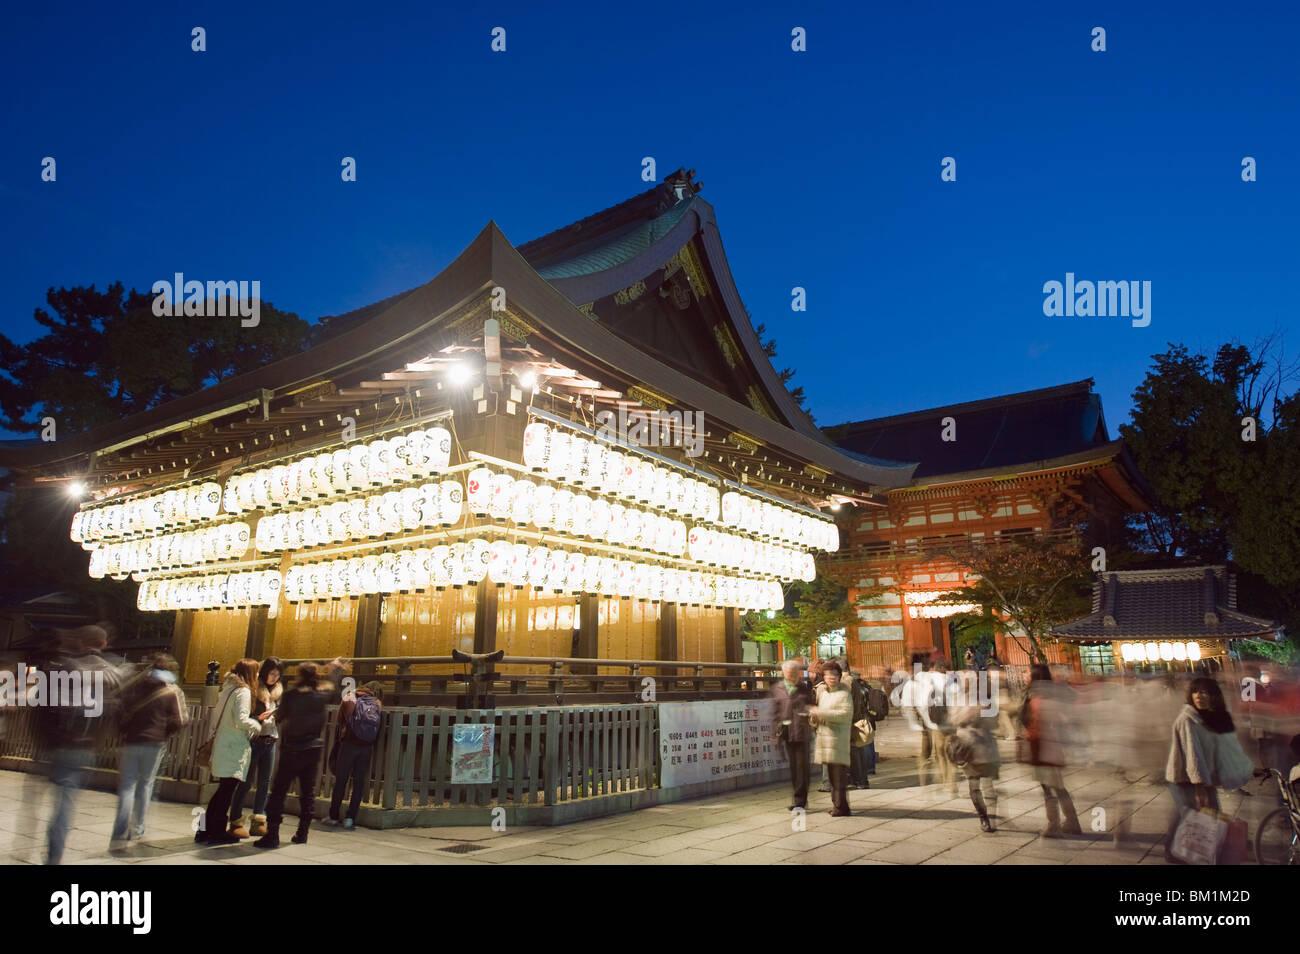 Allumage des lanternes Sanctuaire Yasaka jinja, Kyoto, Japon, Asie Photo Stock